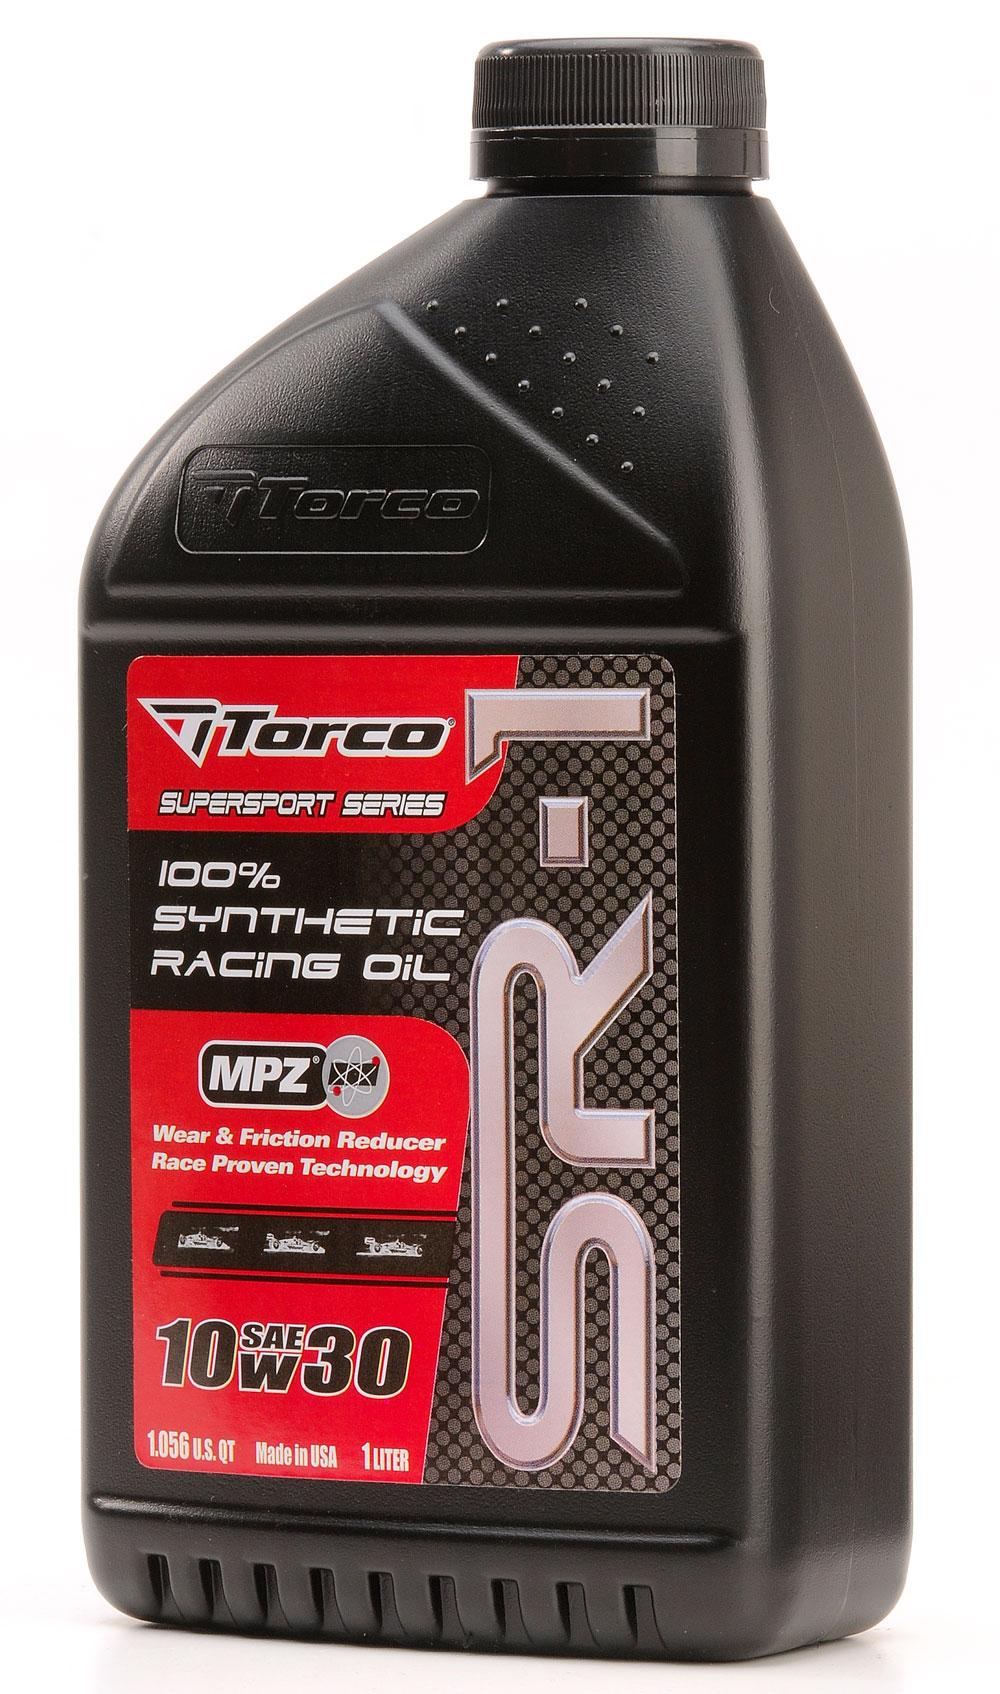 TORCO Malaysia Racing Oil SR-1 SAE 10W30